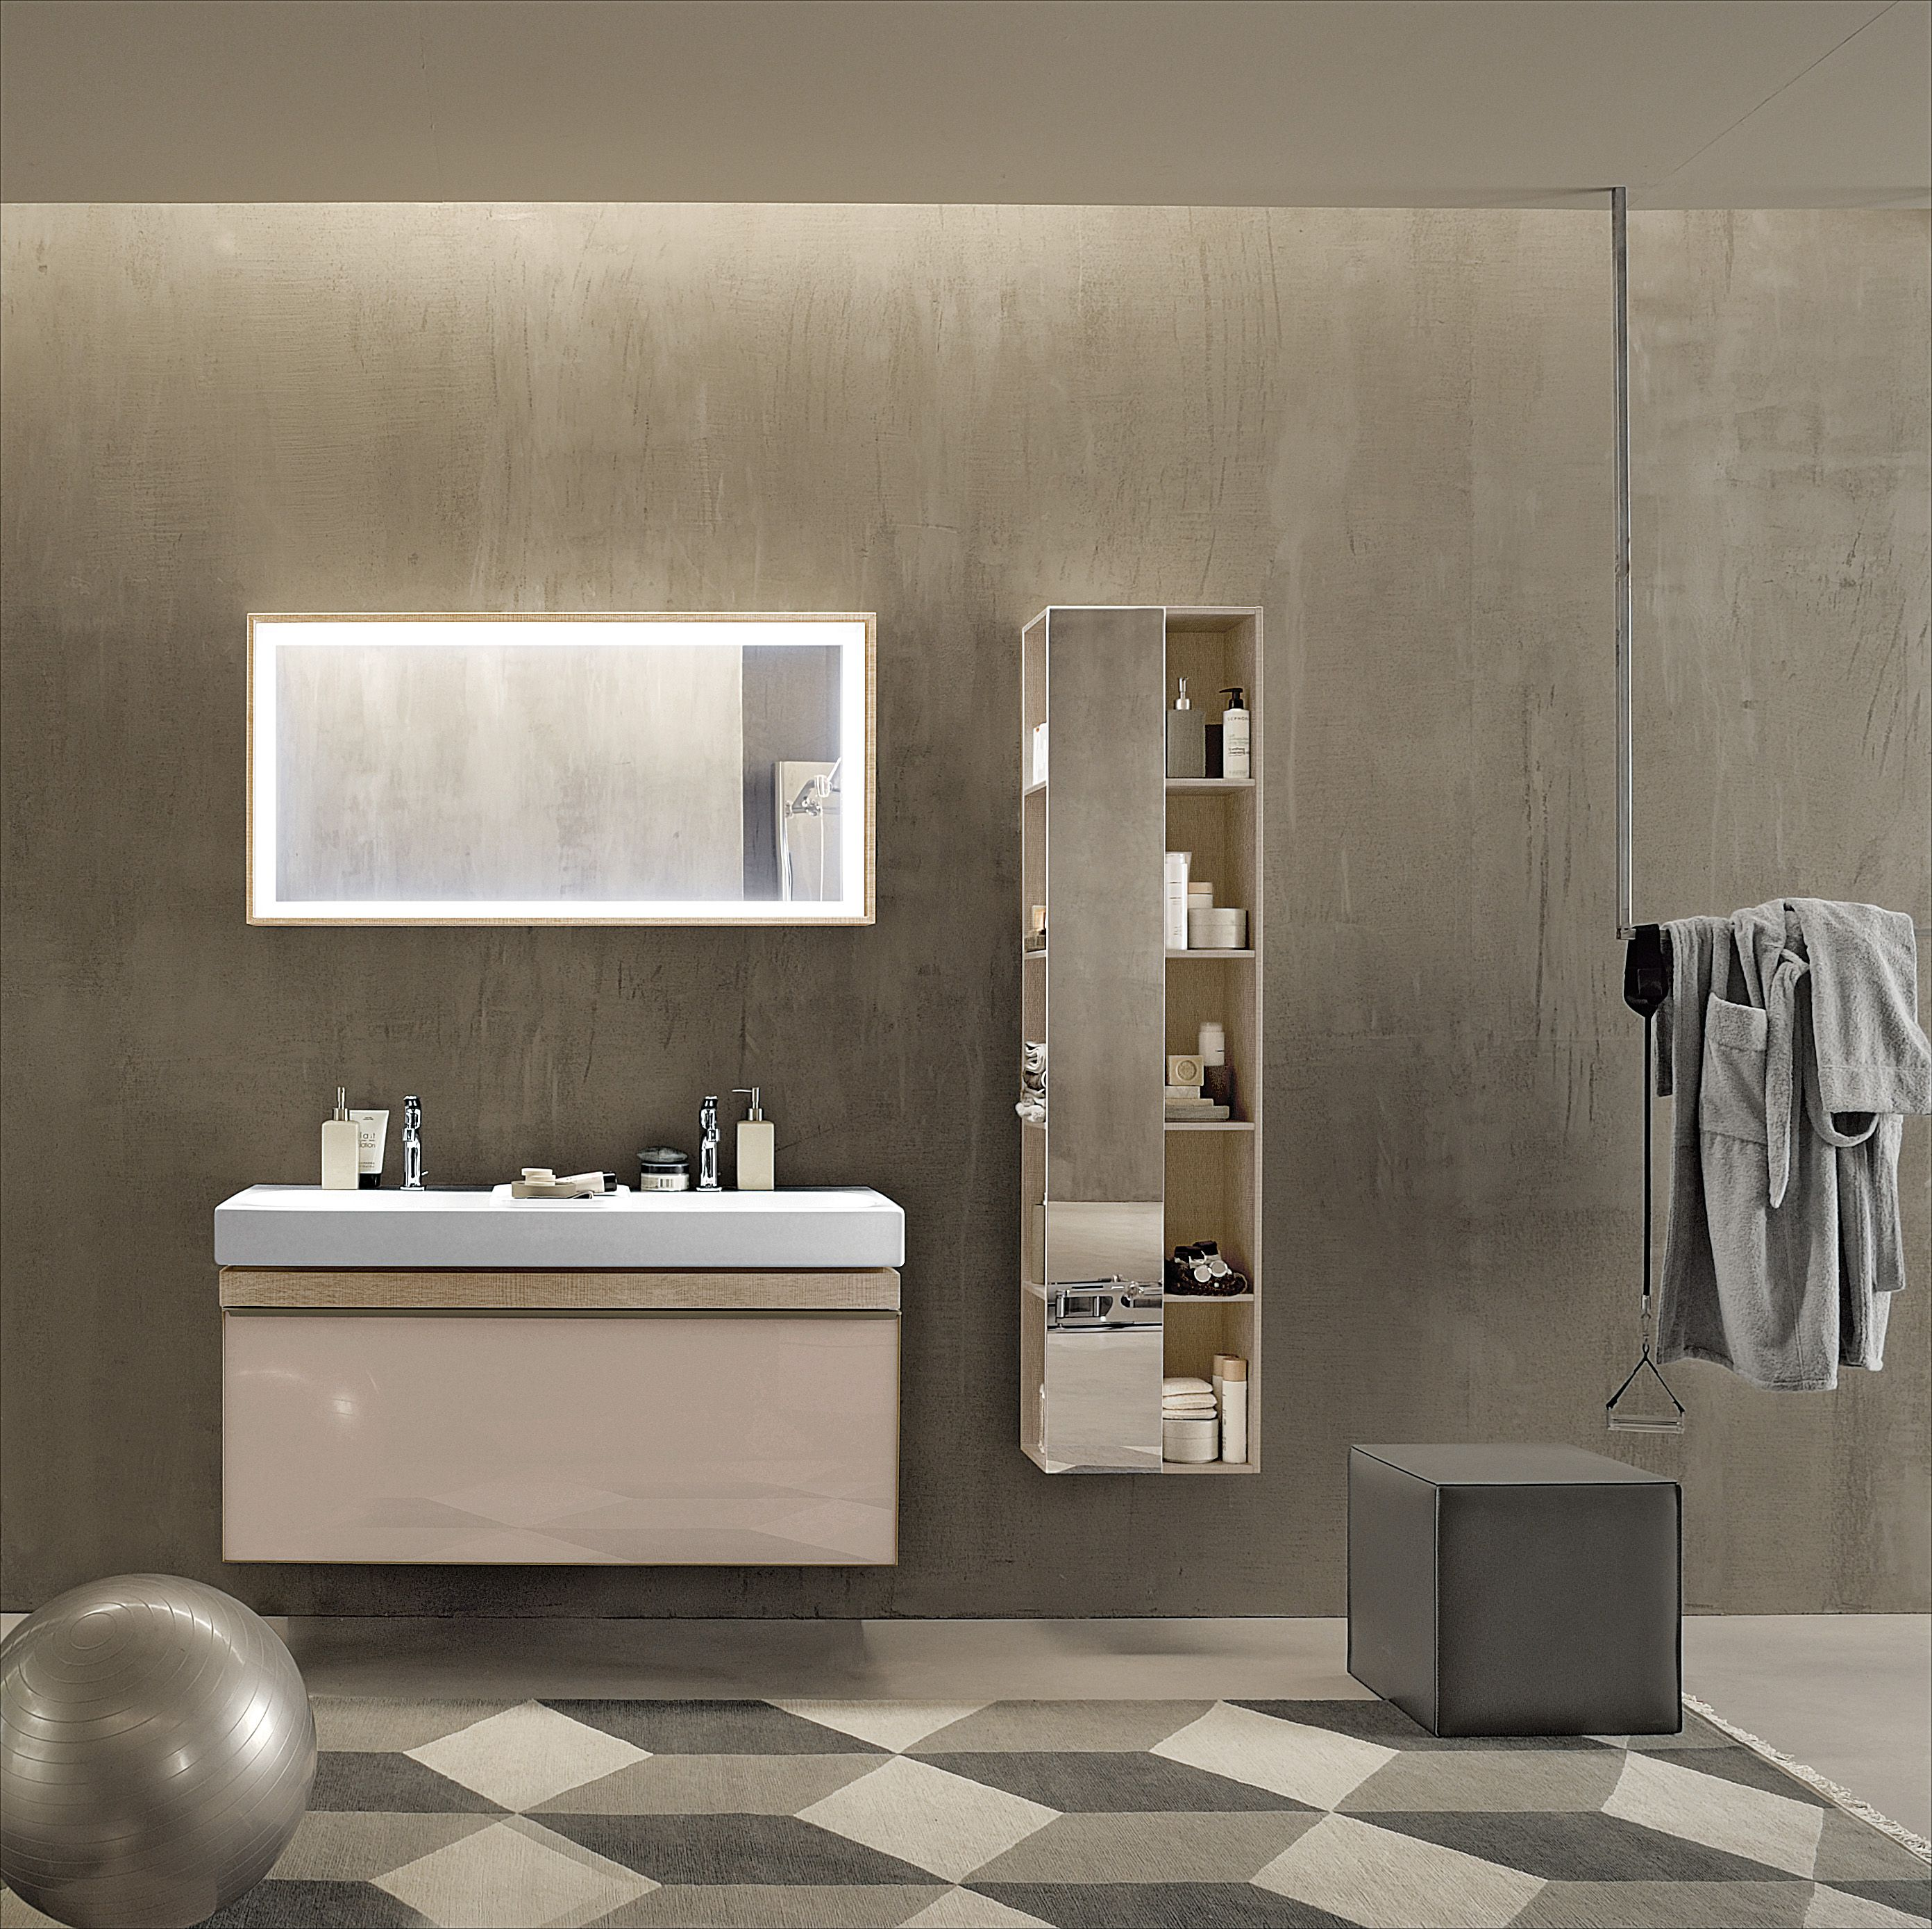 badkameropstelling badmeubel spiegelkast badkamer inspiratie